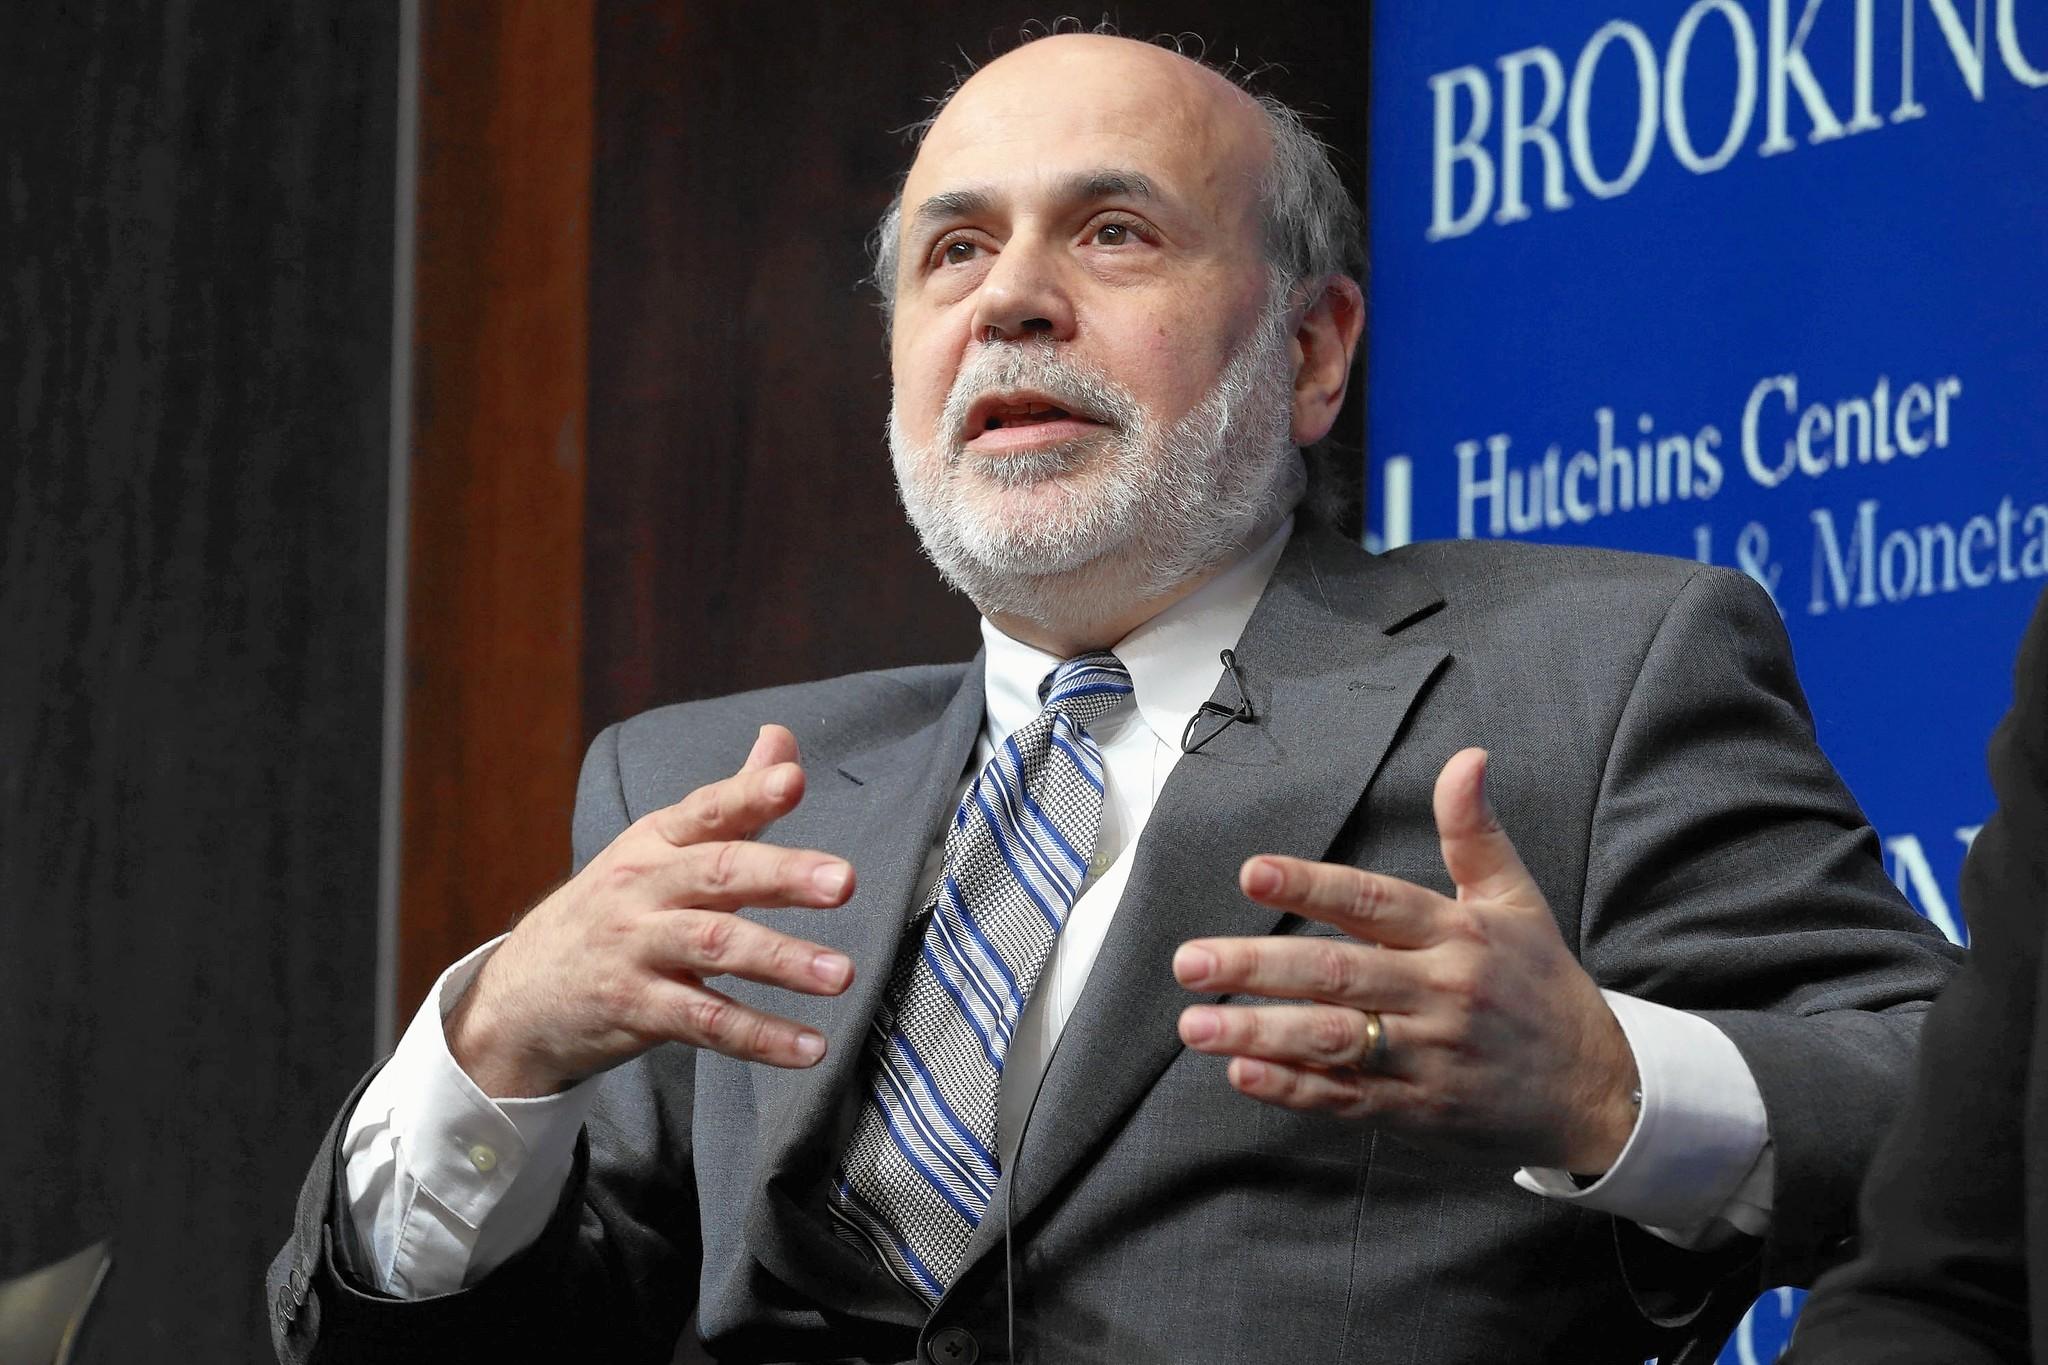 Bernanke: U.S. should have prosecuted individuals after collapse